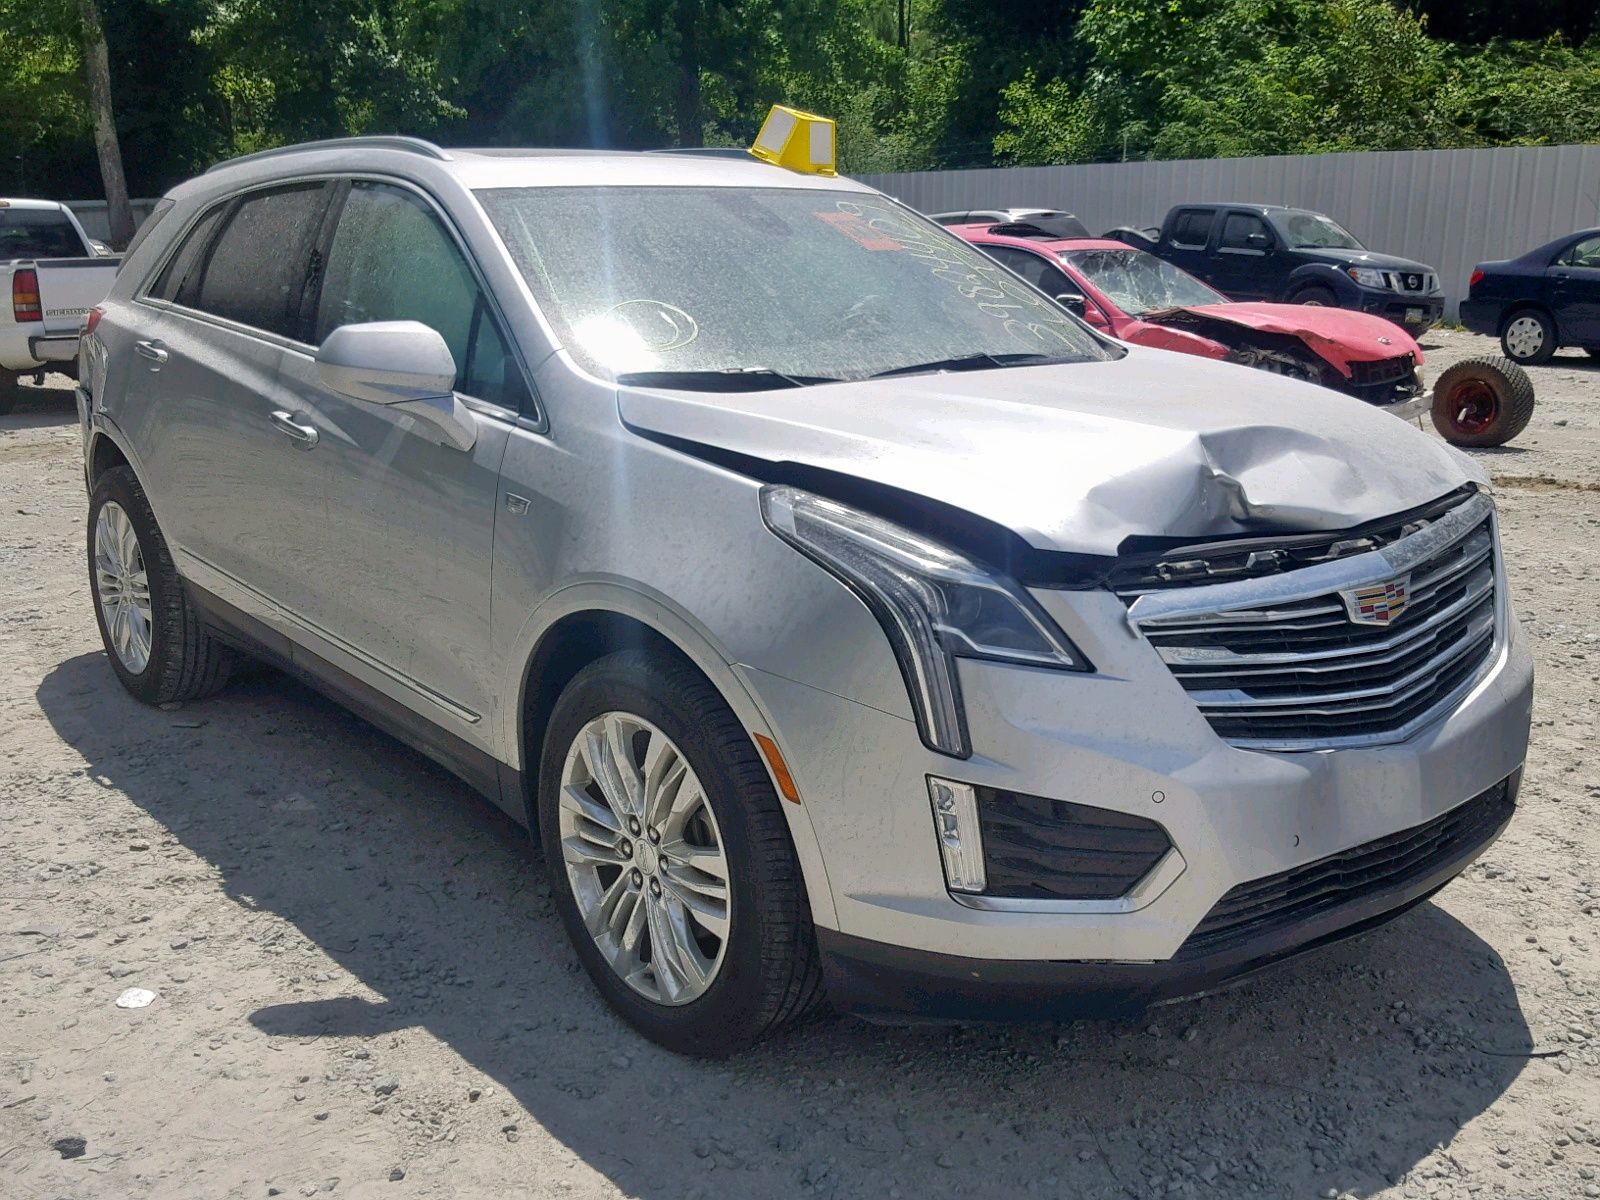 2017 Cadillac Xt5 Premiu 3.6L 6 in NC - Raleigh ...